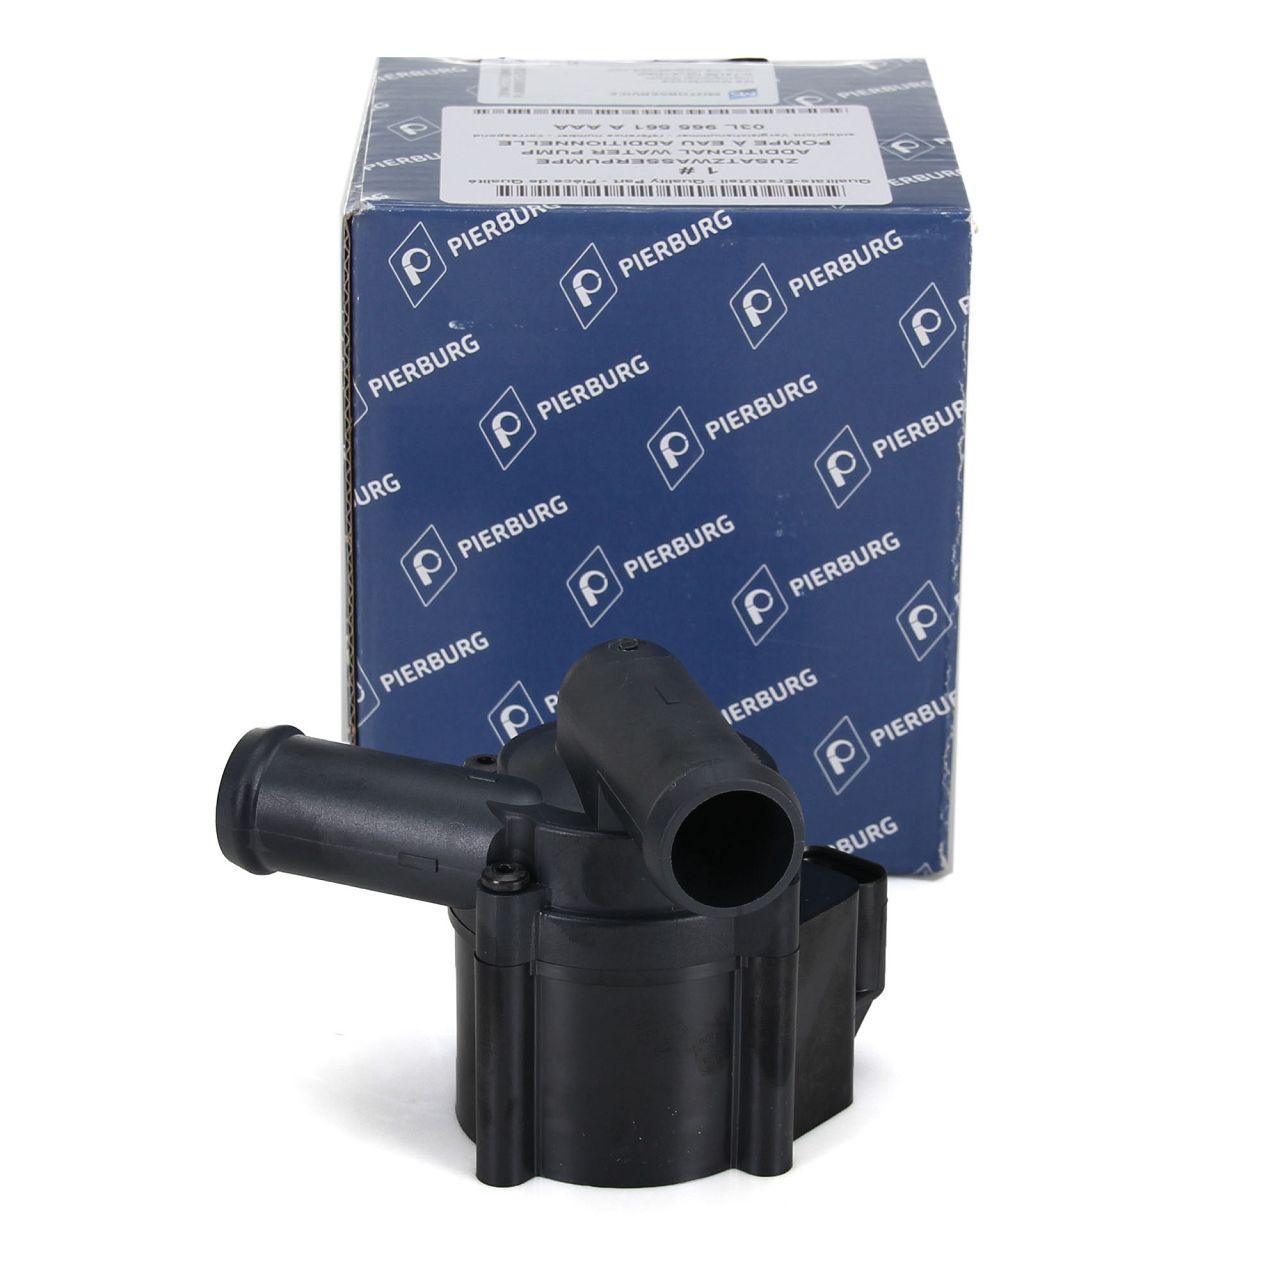 PIERBURG Zusatzwasserpumpe für AUDI A4 B8 A6 C6 Q5 (8RB) A5 2.0 TDI 03L965561